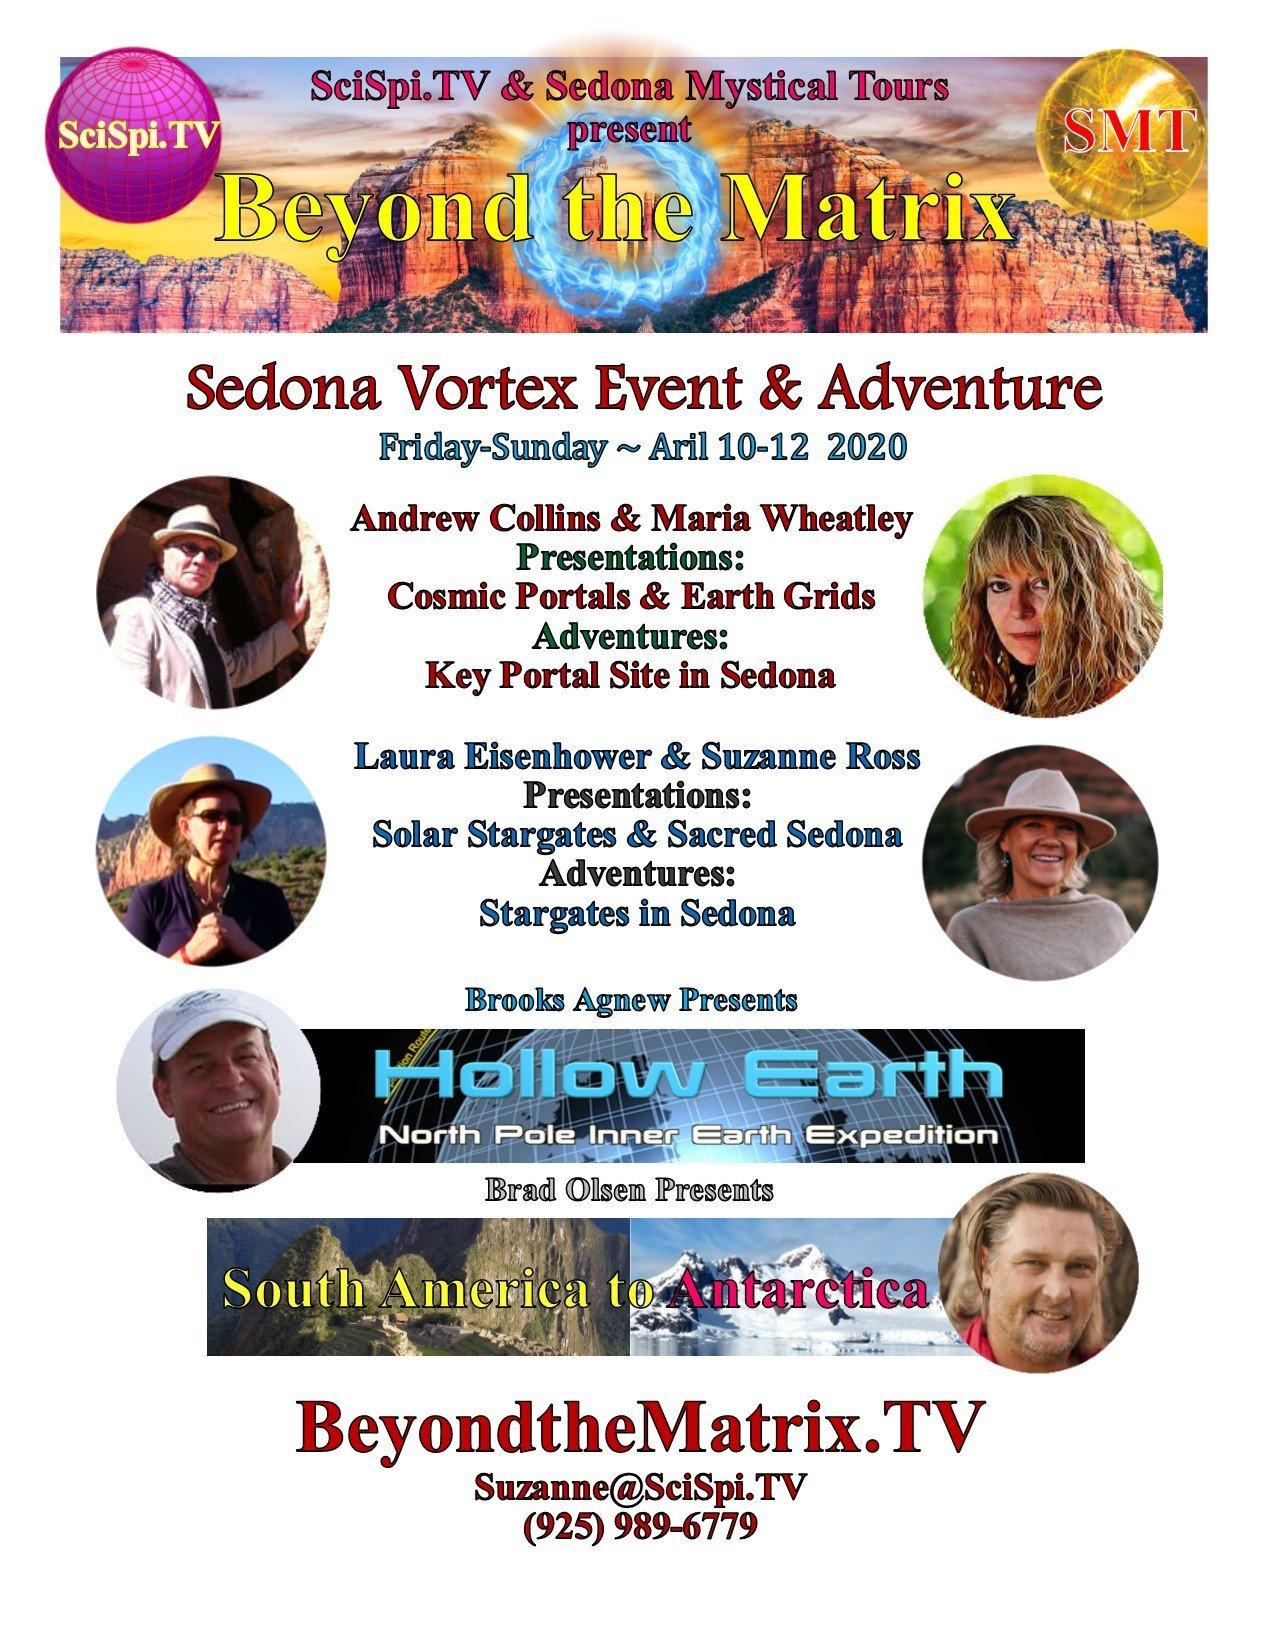 SMT Event & Adventure